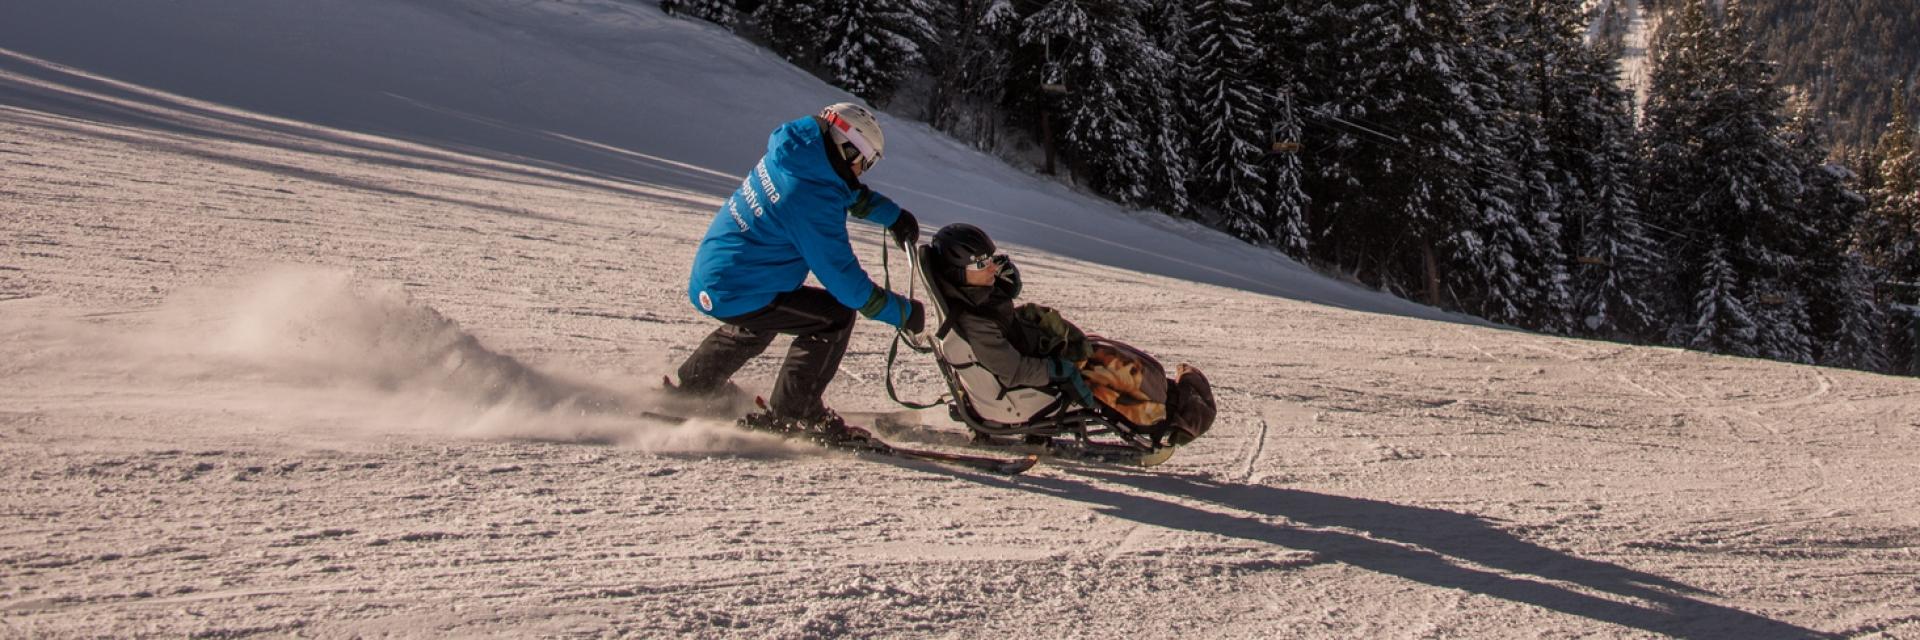 Adaptive skiing at Panorama Mountain Resort. An accessible ski experience at Panorama Mountain Resort.